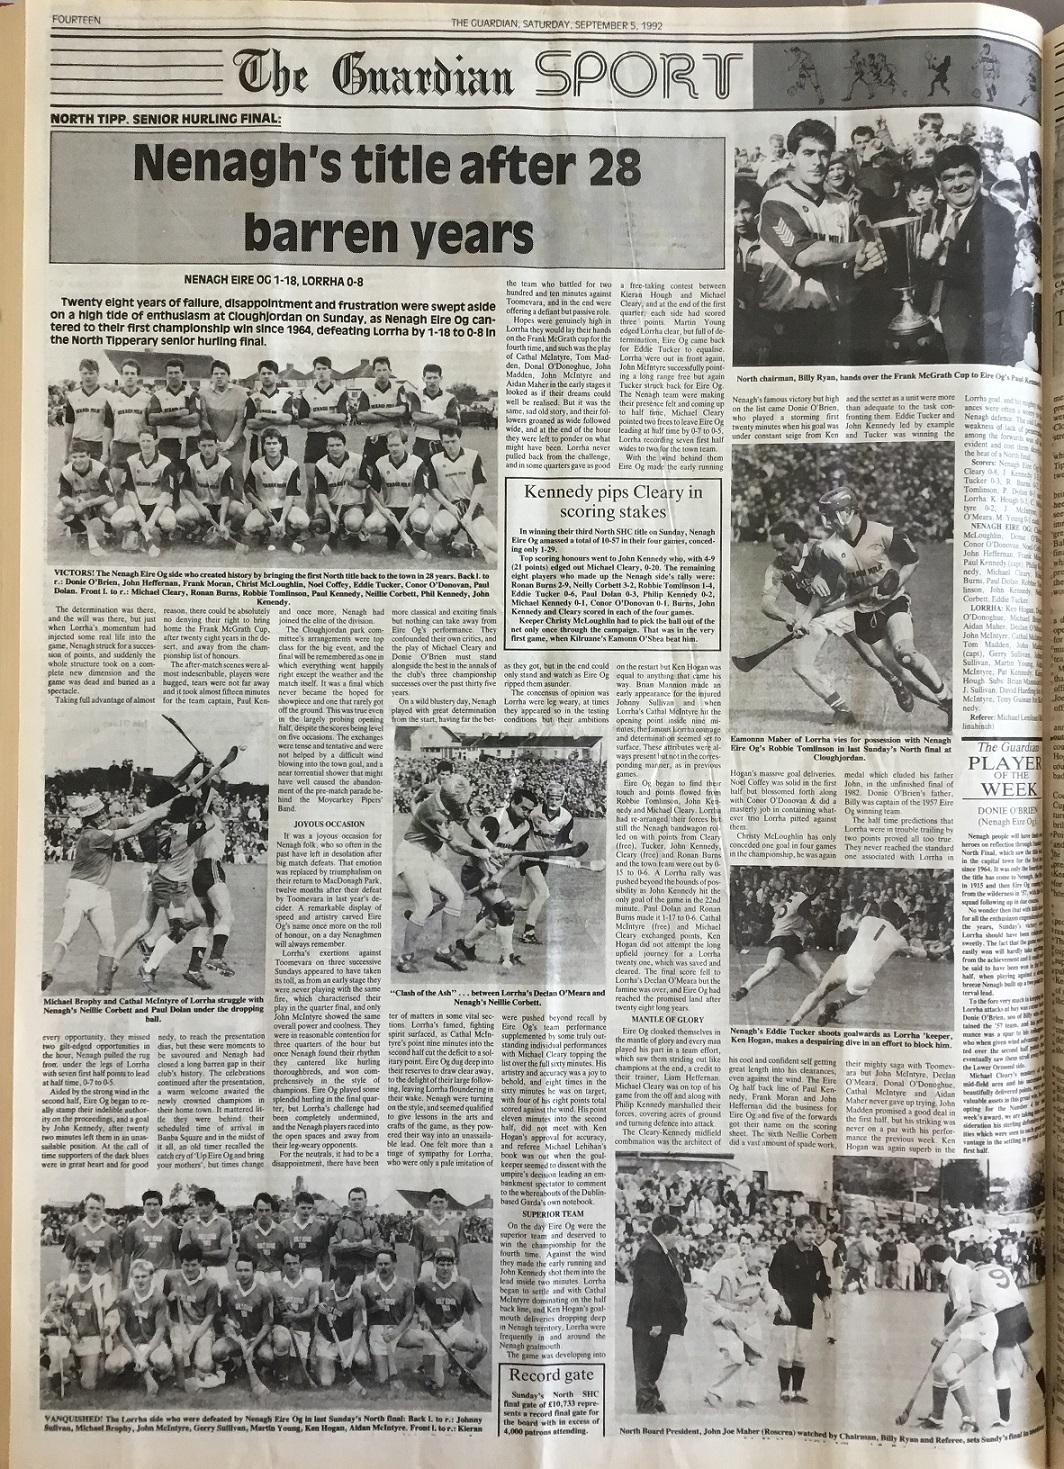 1992 North hurling final